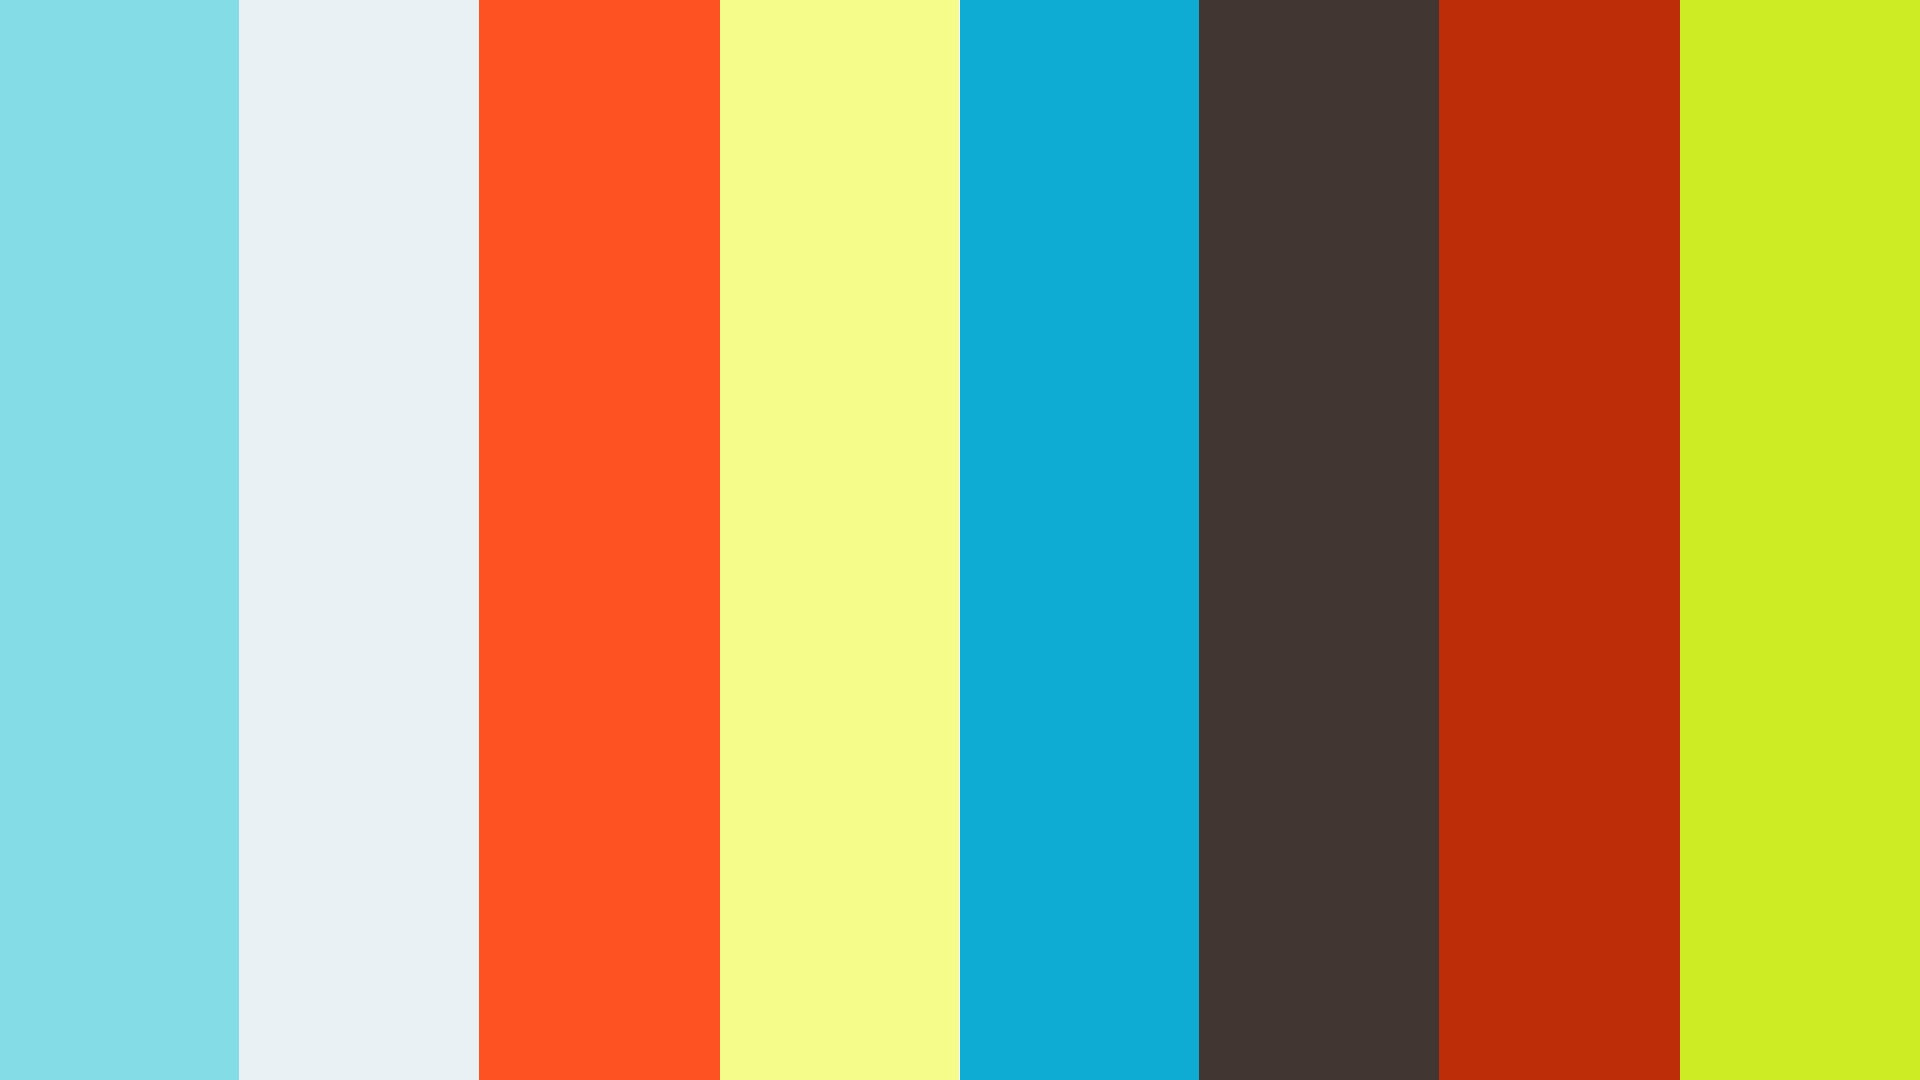 Watch FilmRaker - Jon Small and crew - Jonty Velcro on our Free Roku Channel